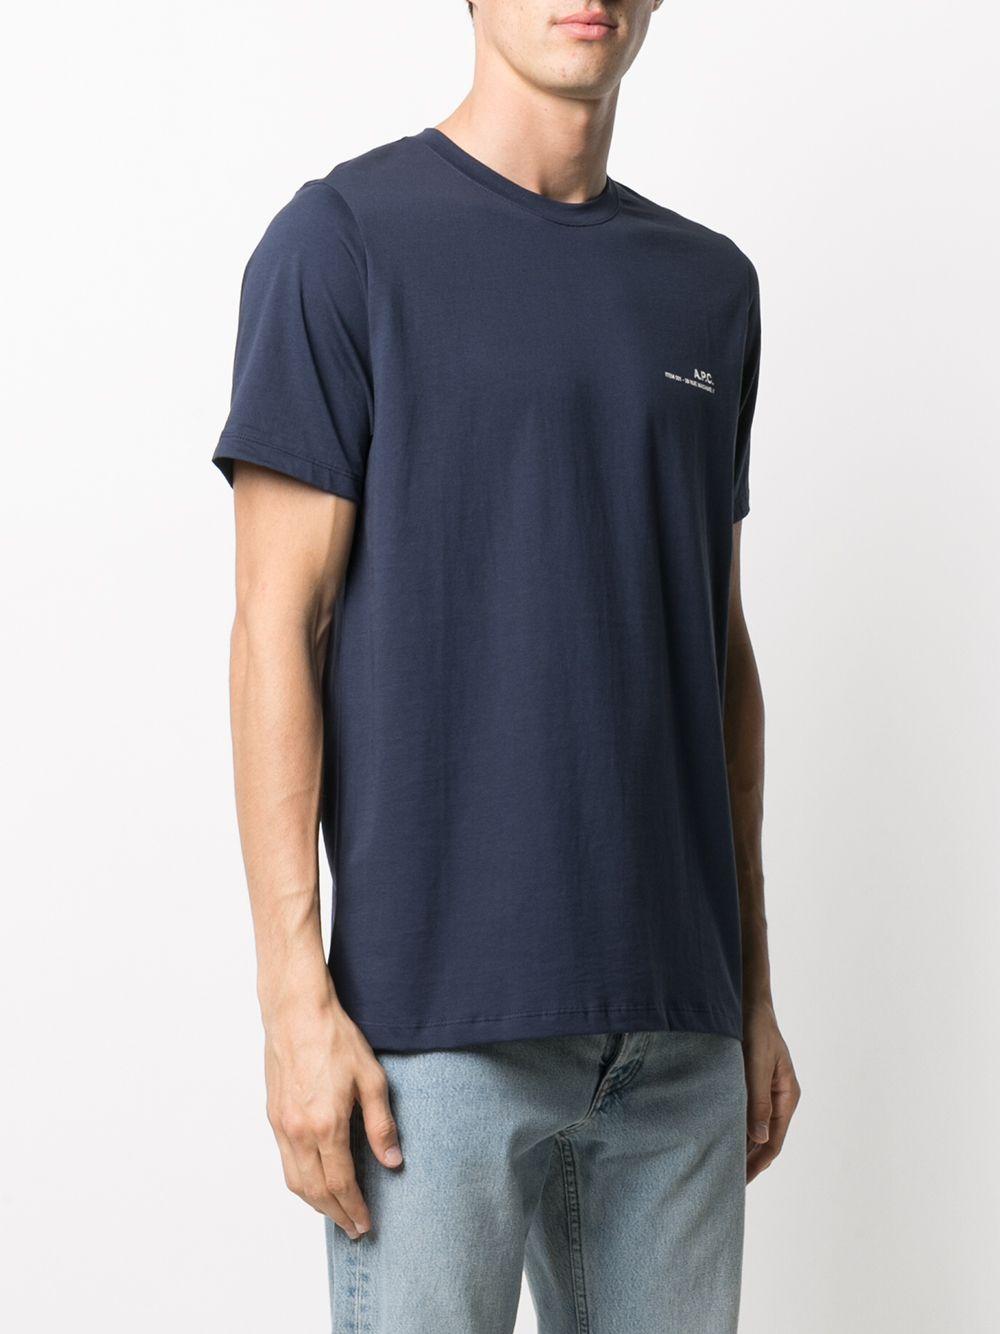 Logo t-shirt Man Blue Cotton A.P.C. | T-shirts | COEOP-H26904IAK